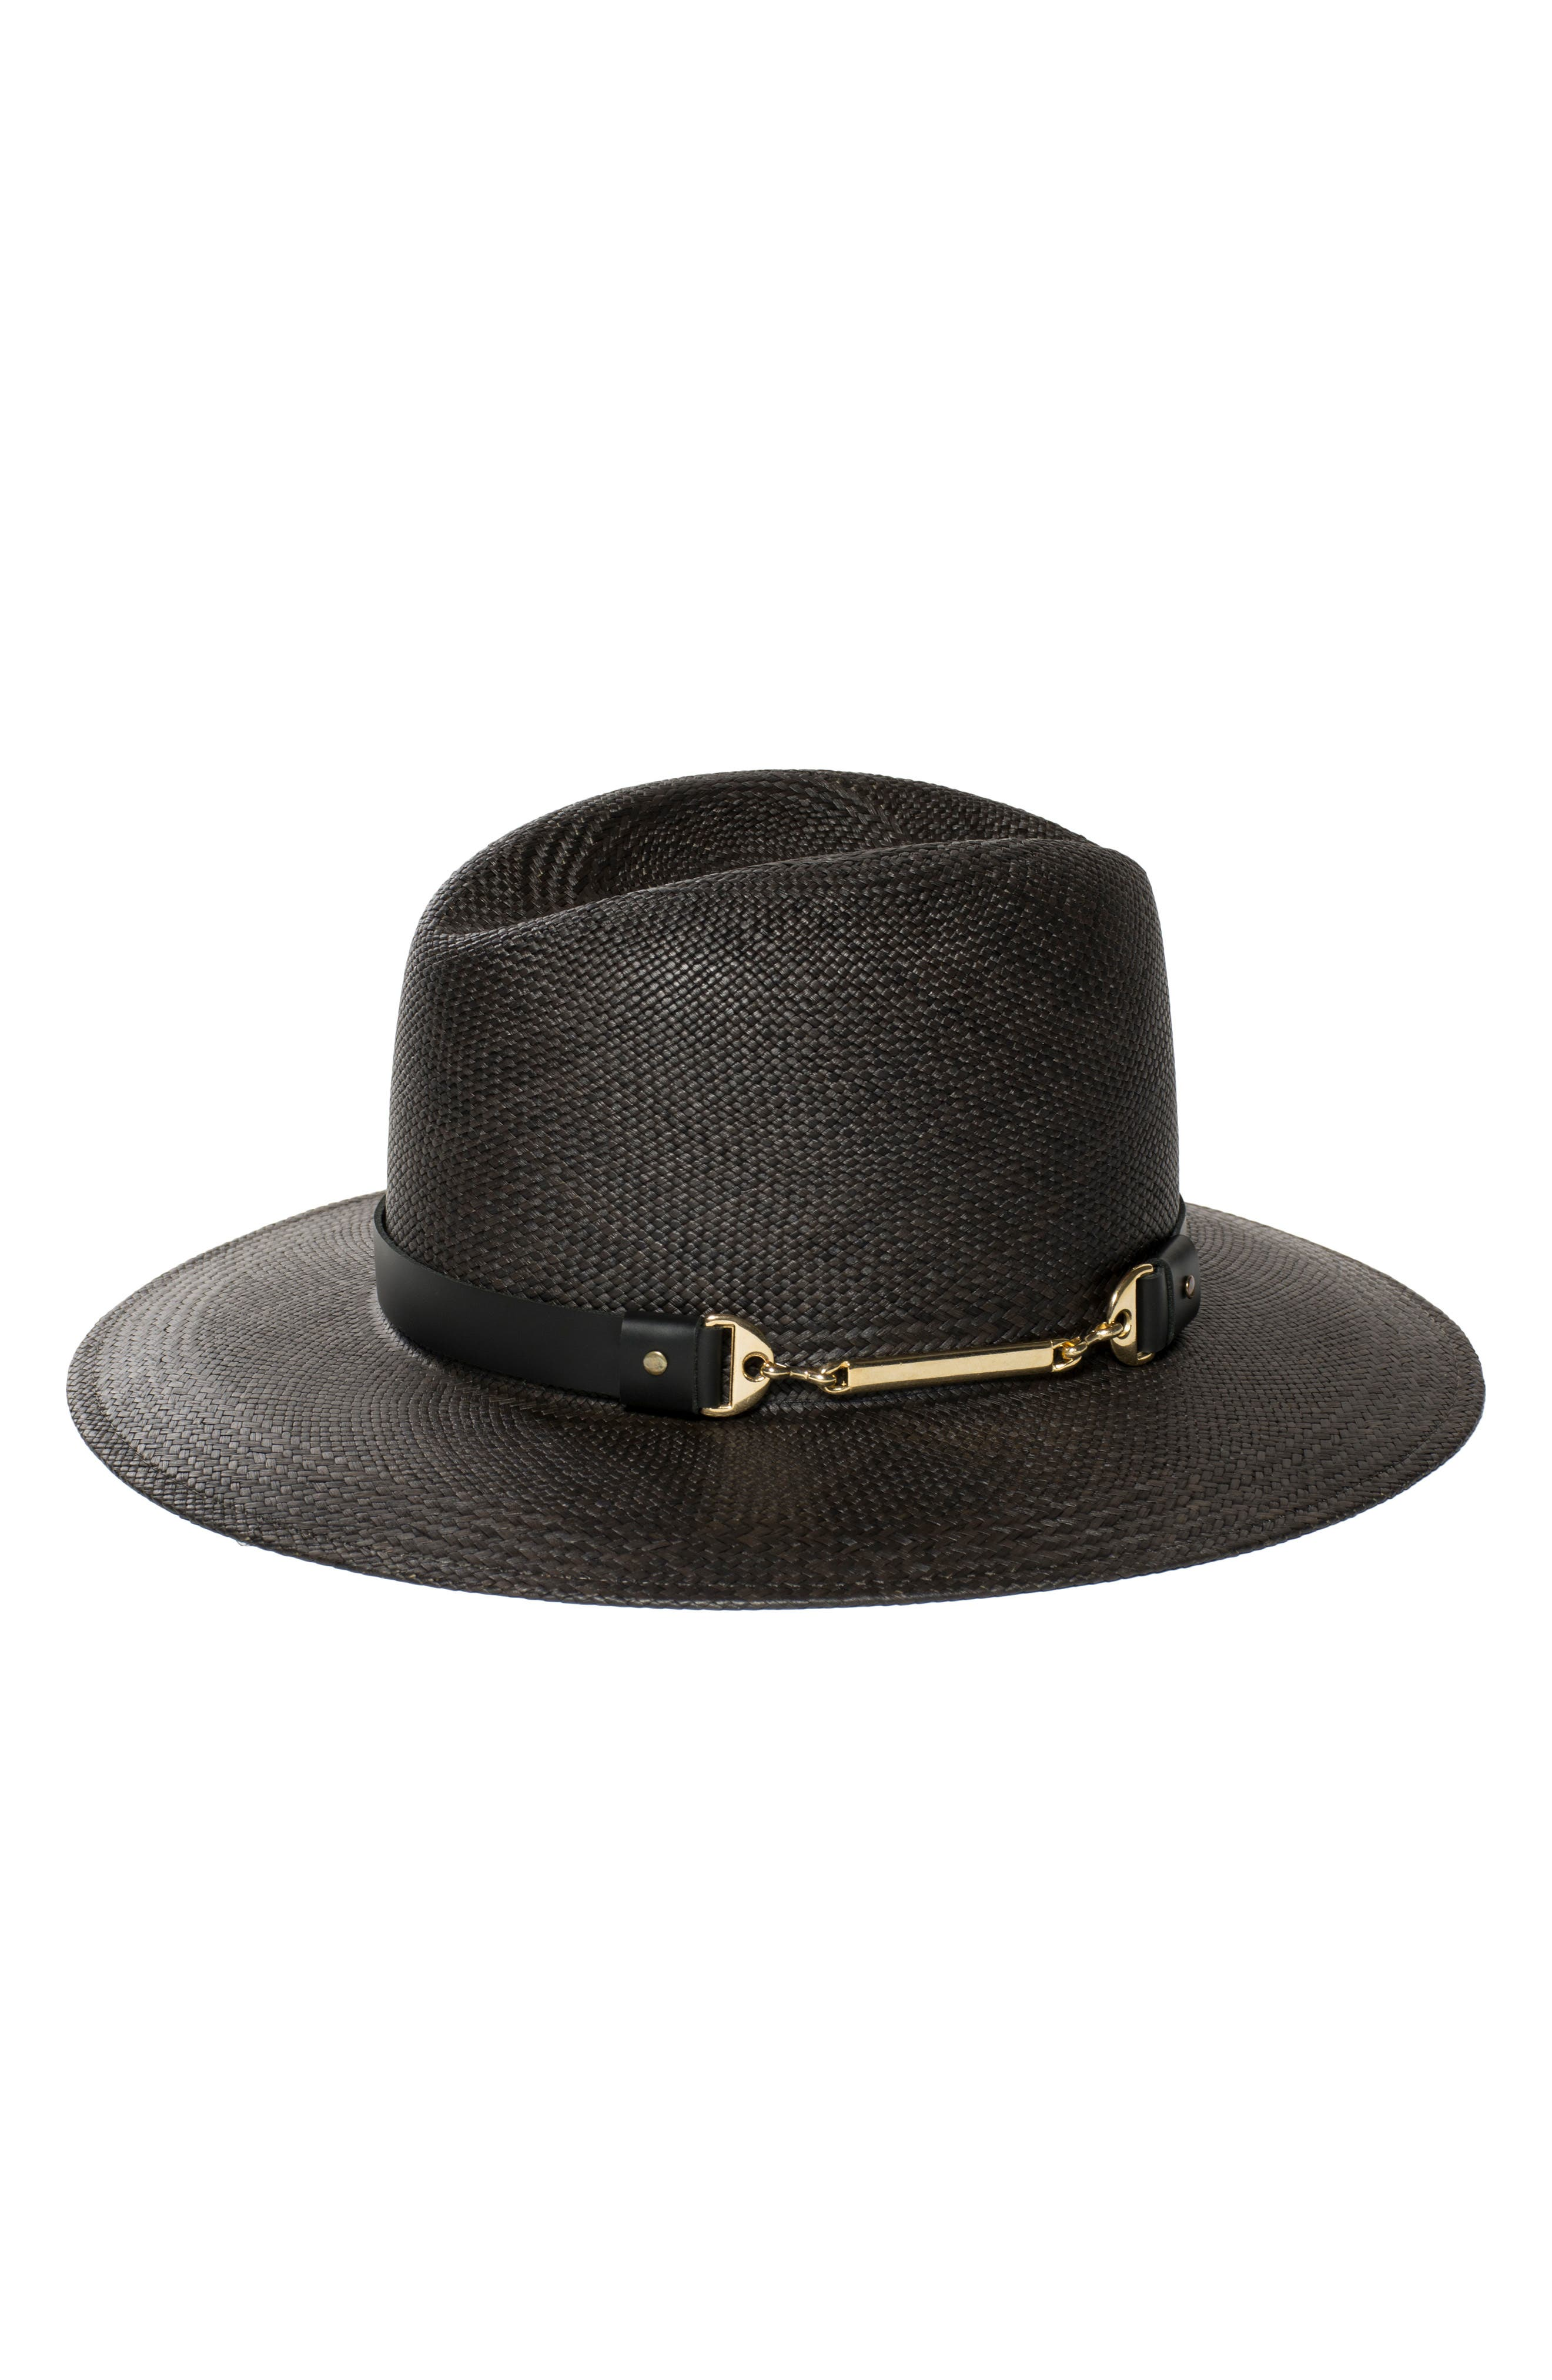 BIJOU VAN NESS THE MARLENE STRAW PANAMA HAT - BLACK